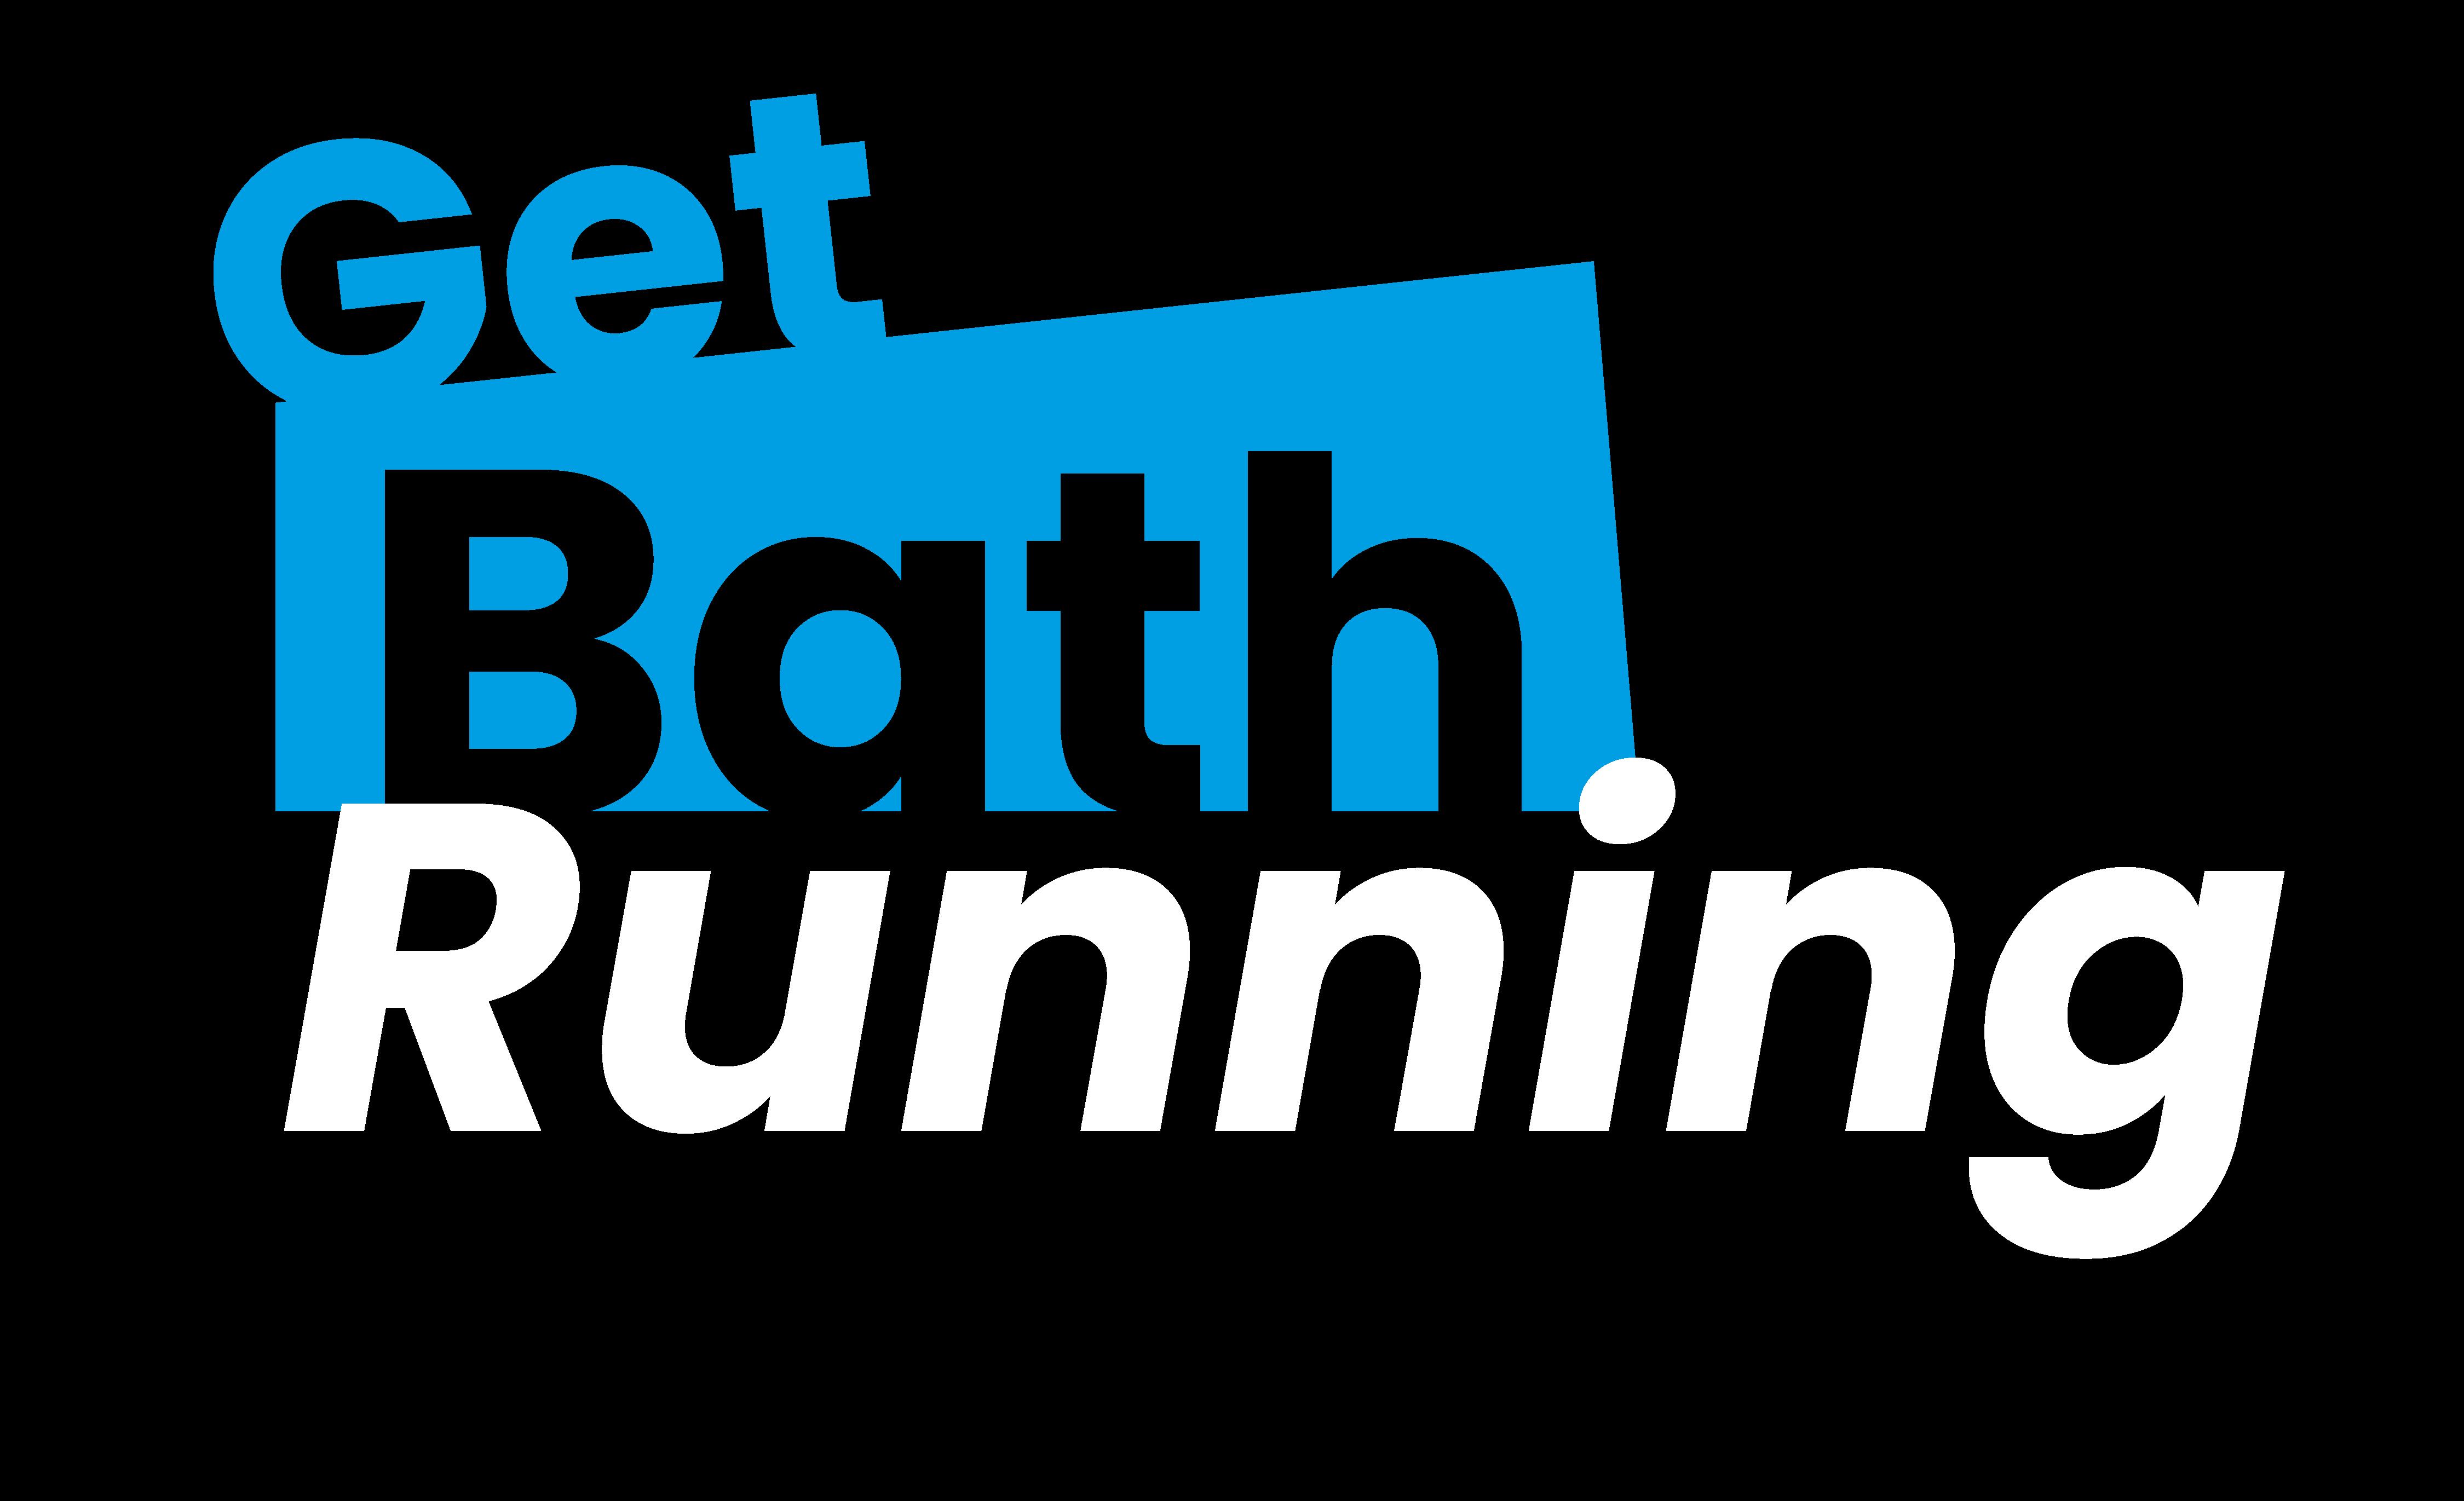 Get Bath Running